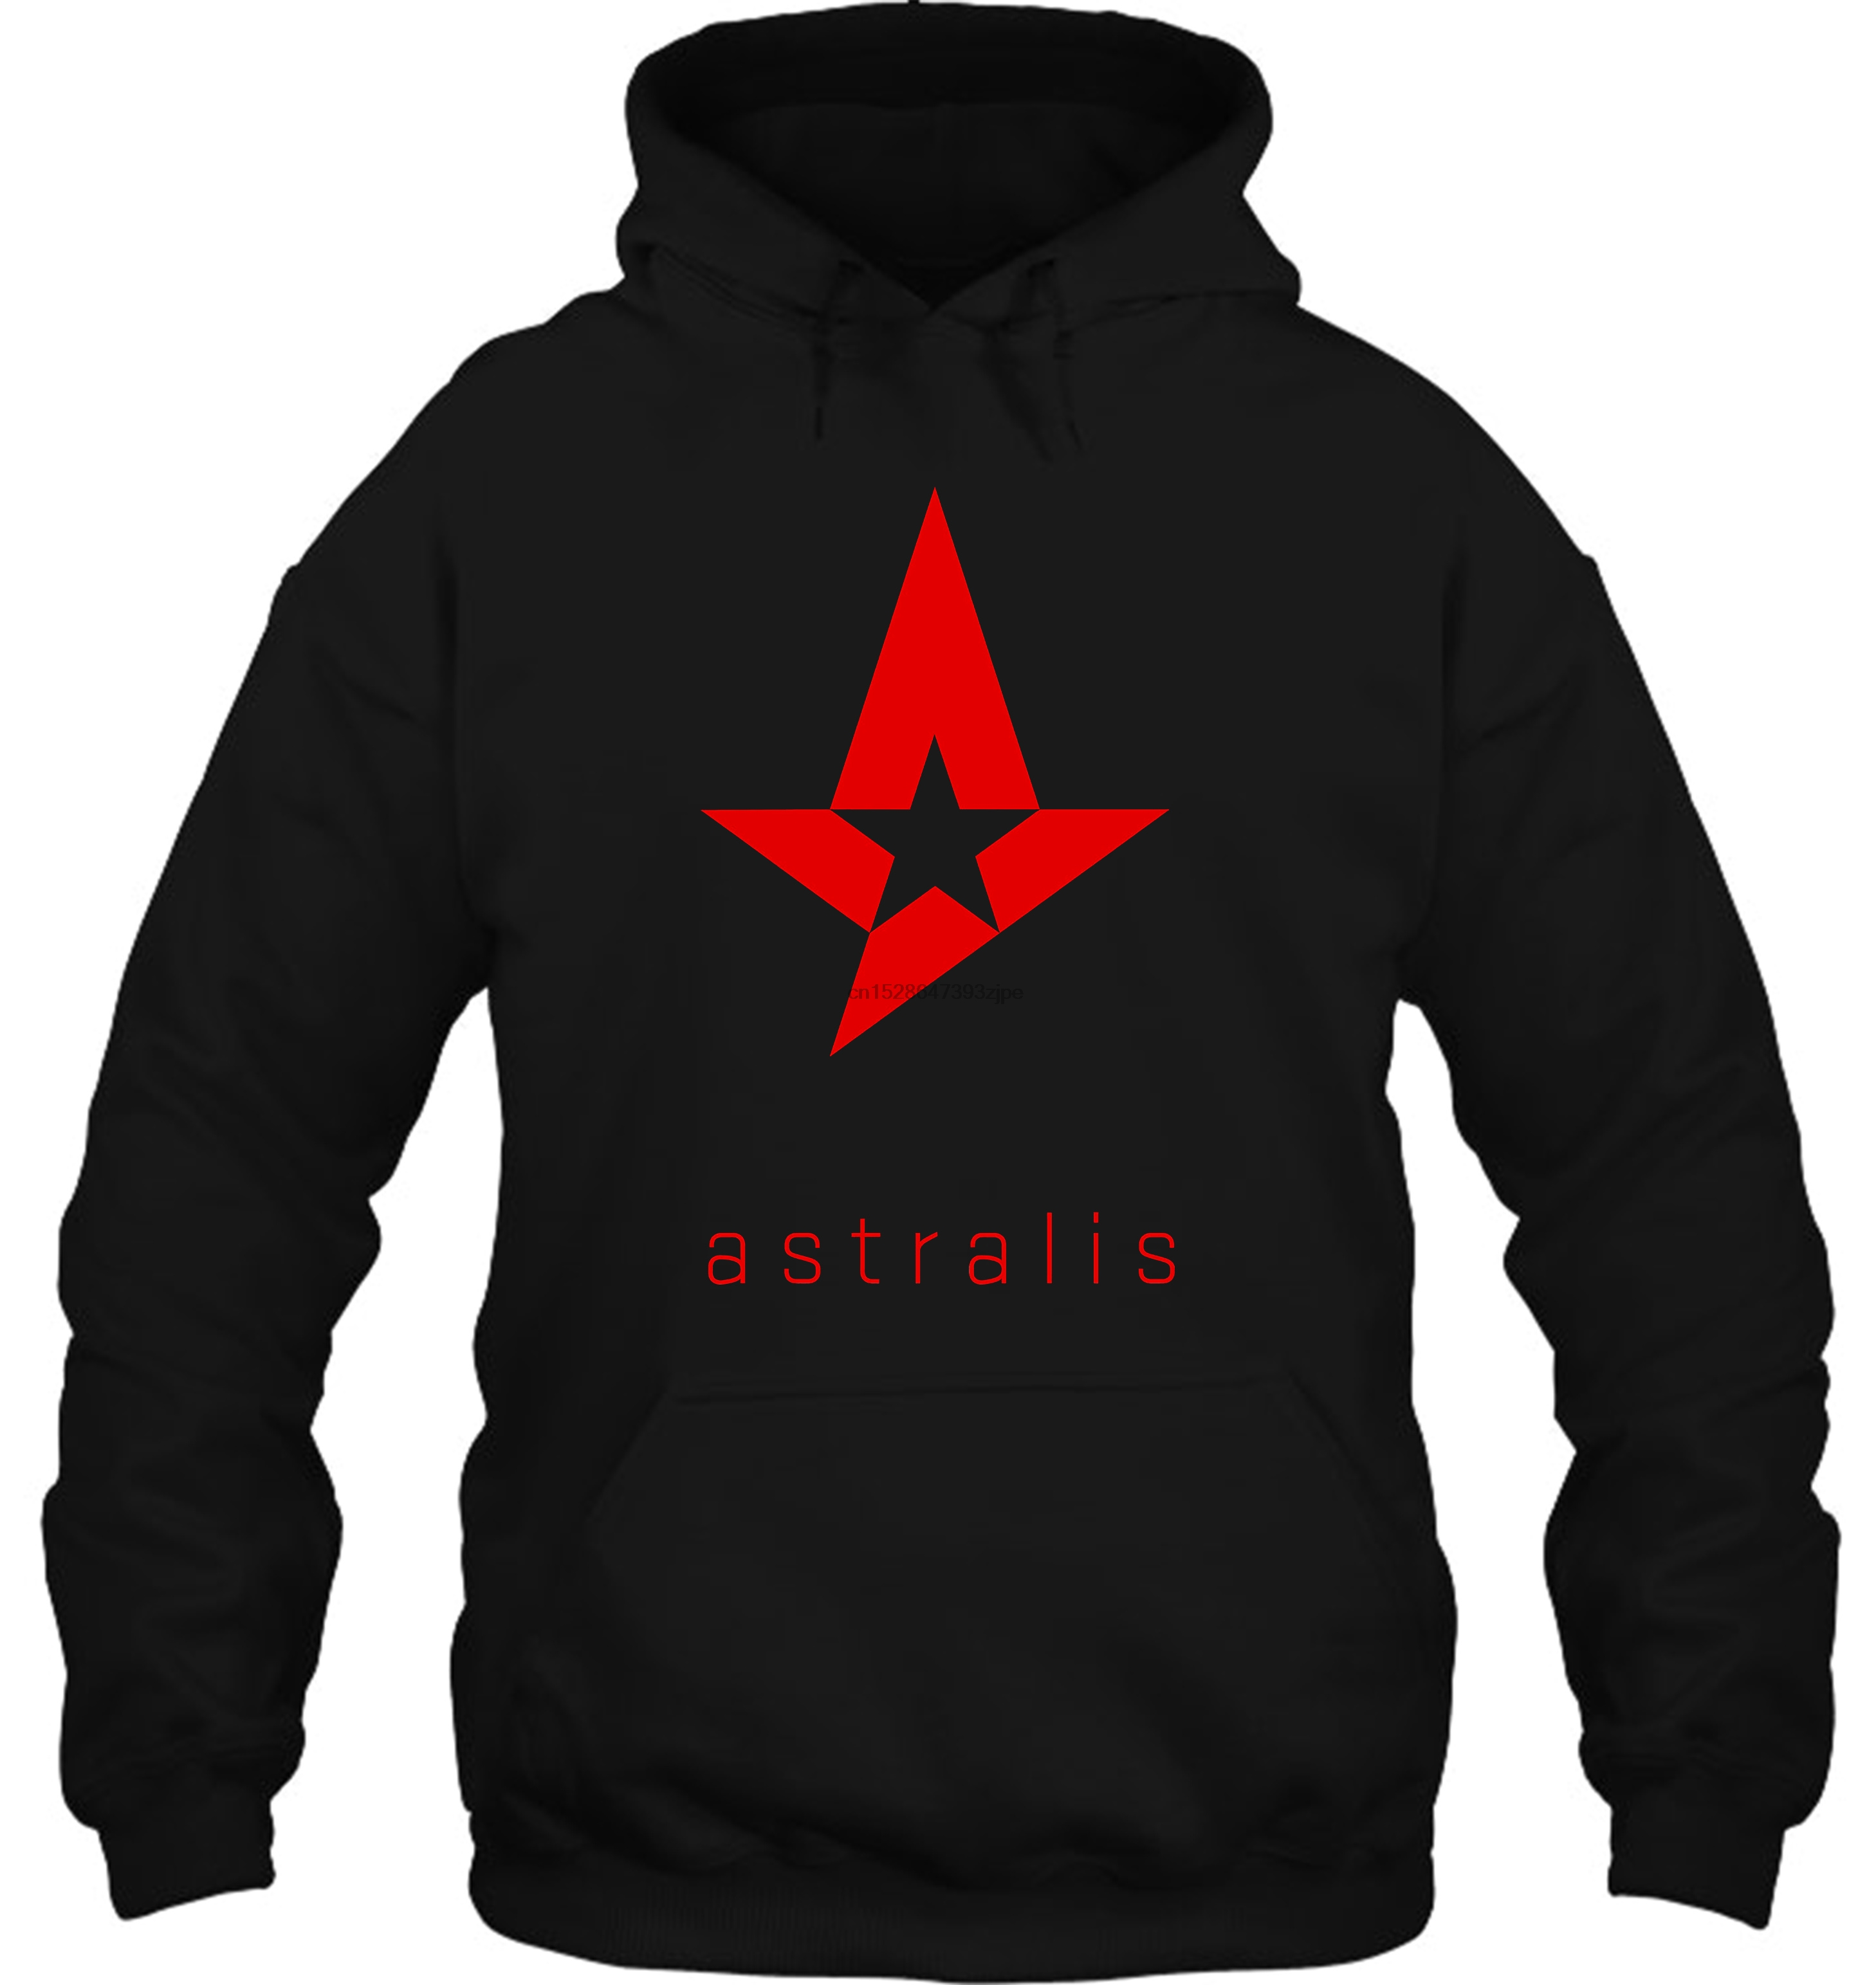 Fashion Cool Funny Astralis Customized Printed Streetwear Men Women Hoodies Sweatshirts